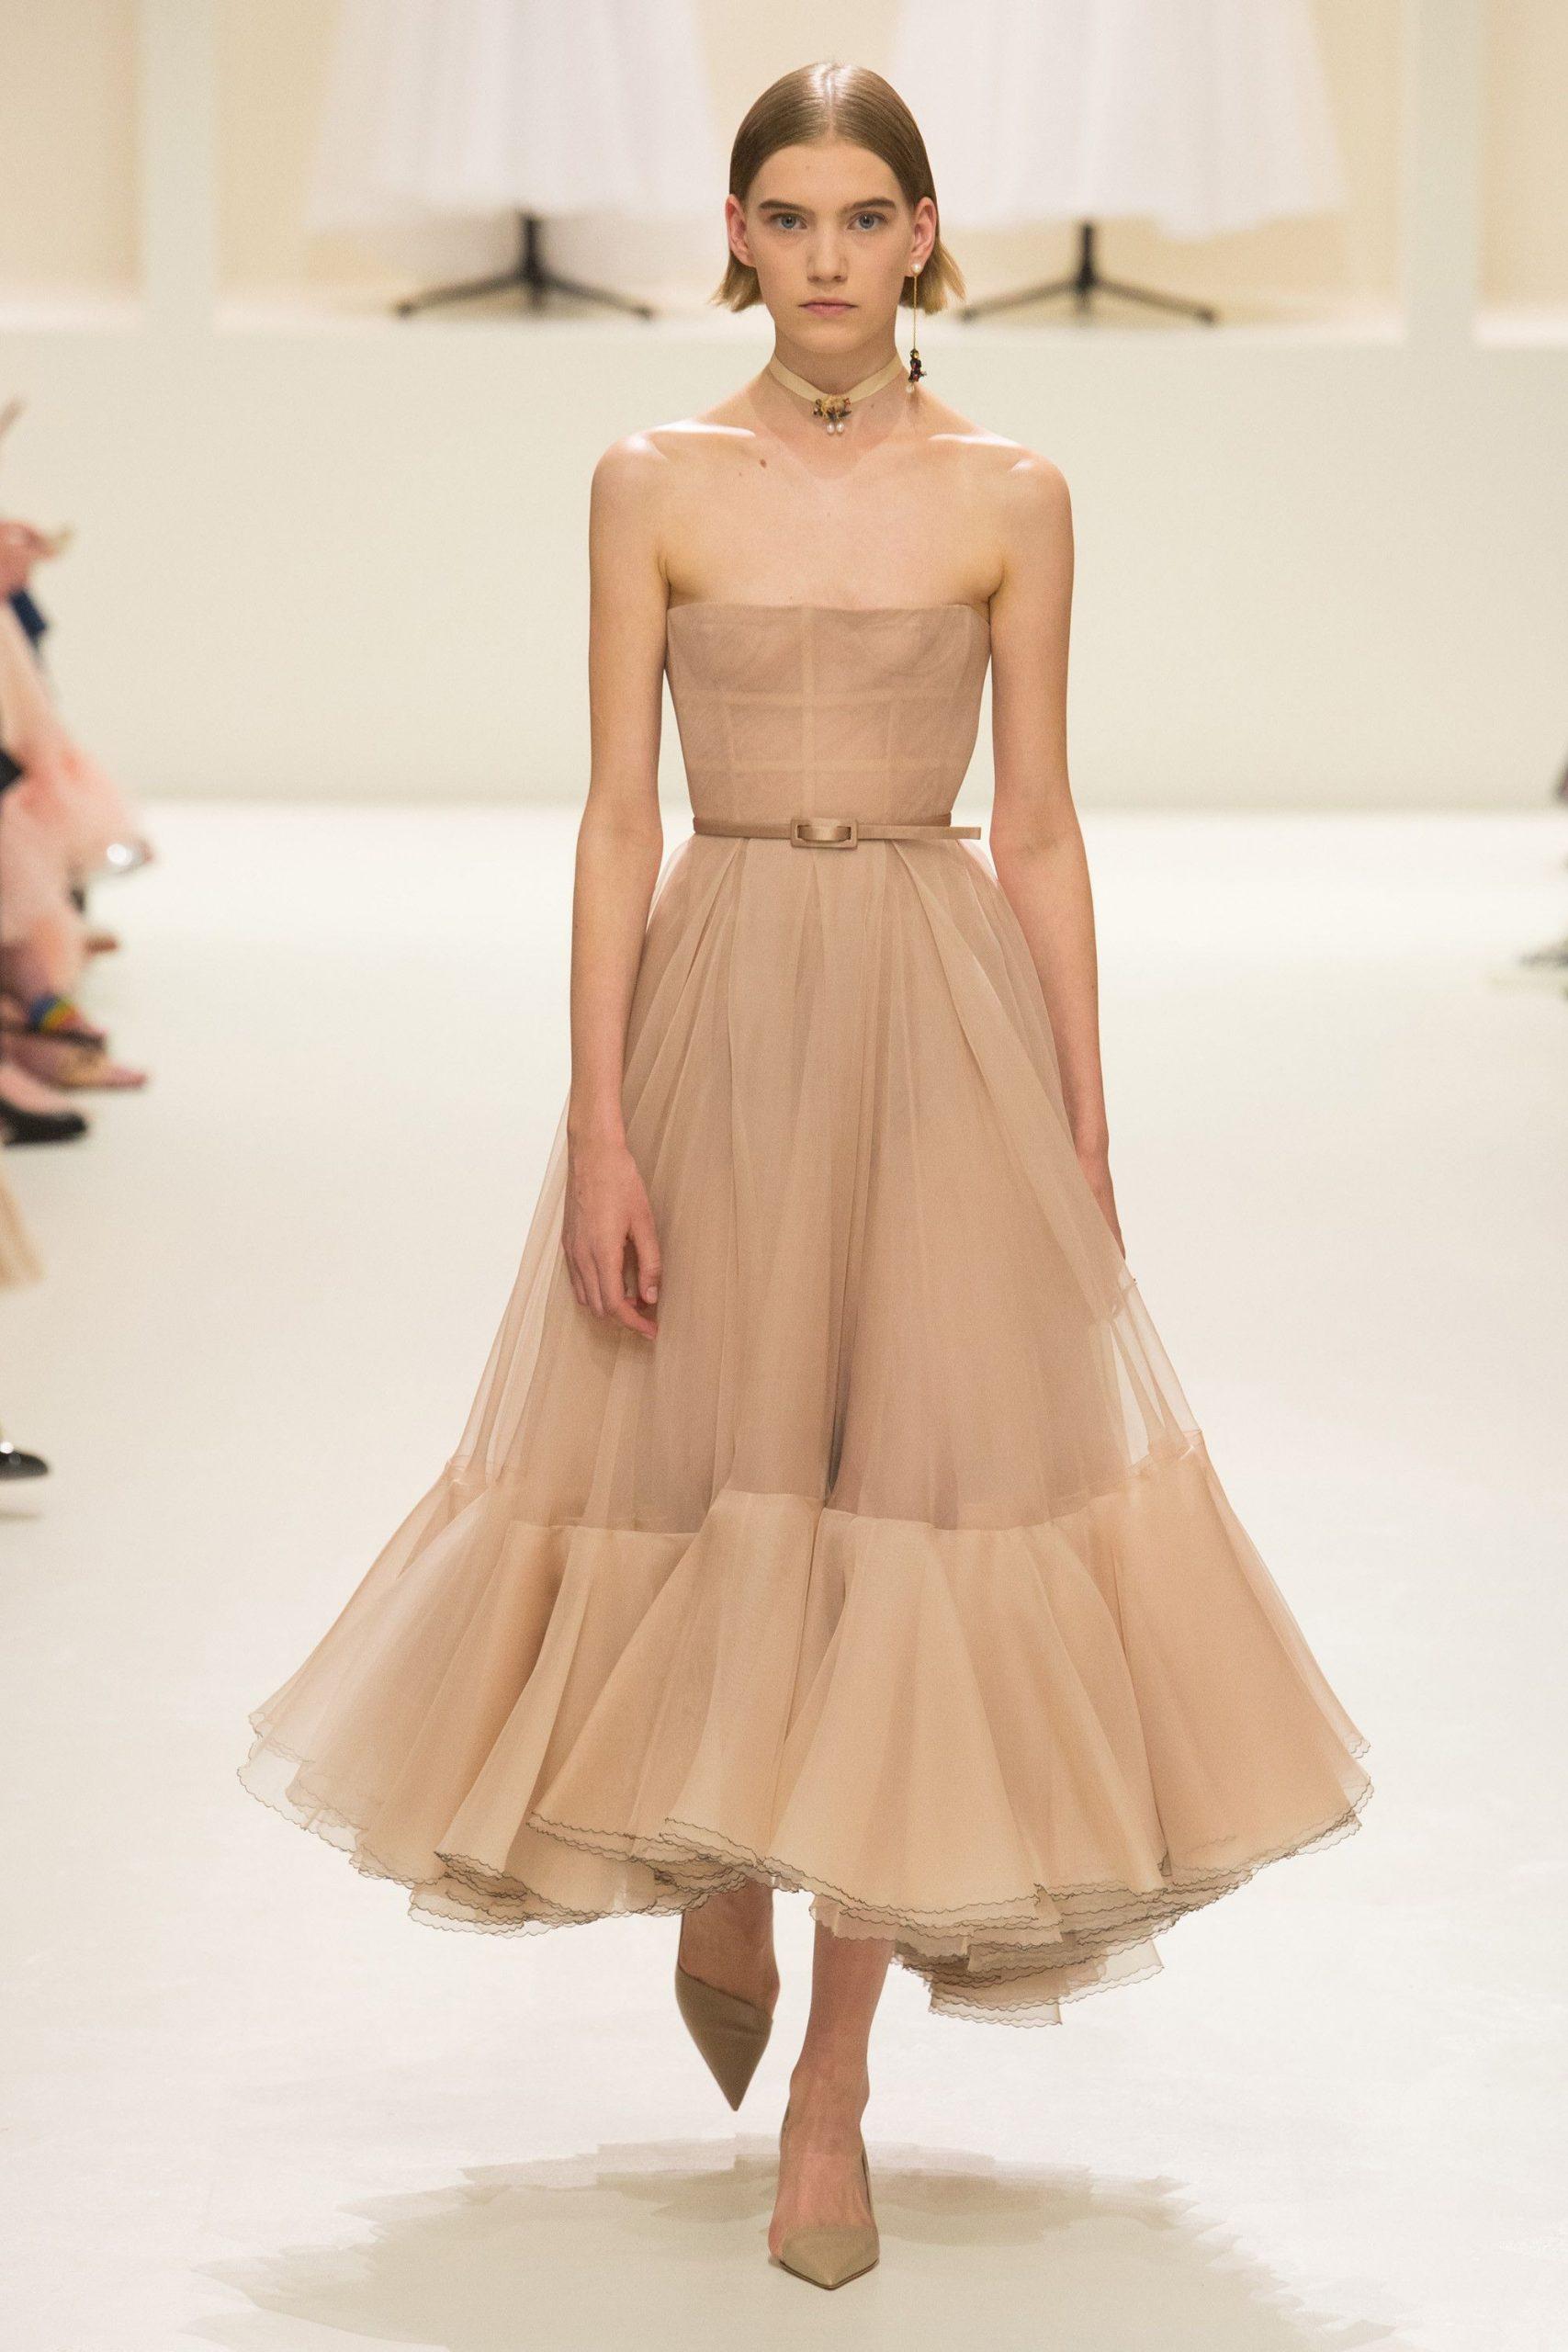 20 Genial Dior Abendkleid Stylish17 Kreativ Dior Abendkleid Galerie